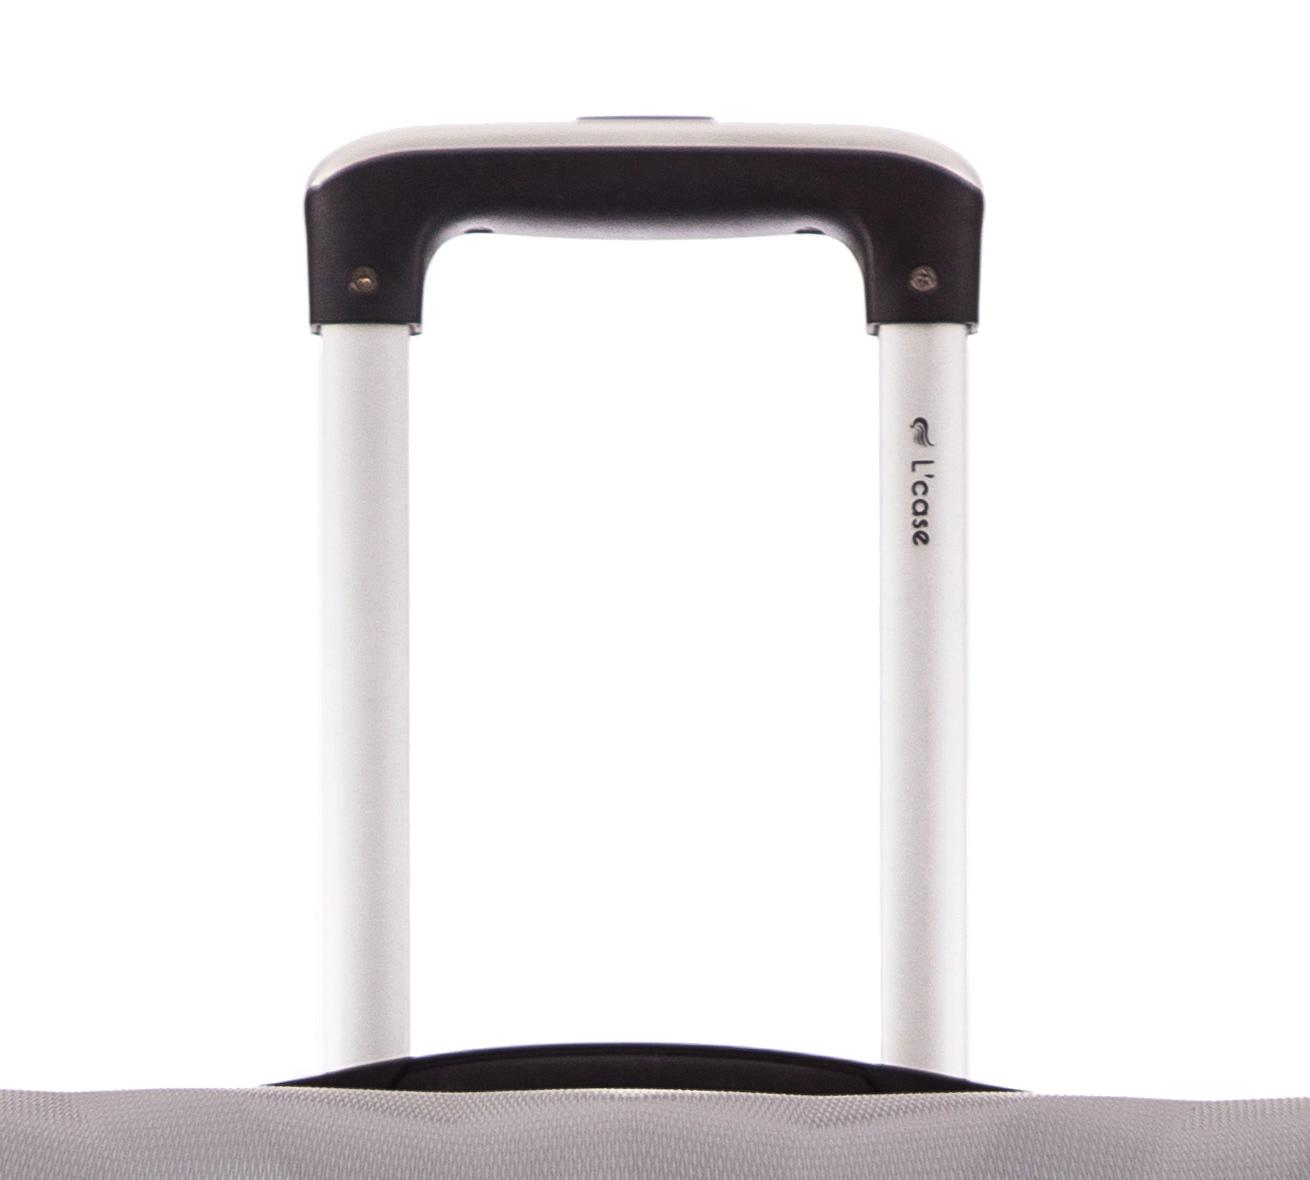 Чемодан со съемными колесами L'case Phuket-20 Серебро ручная кладь (S)